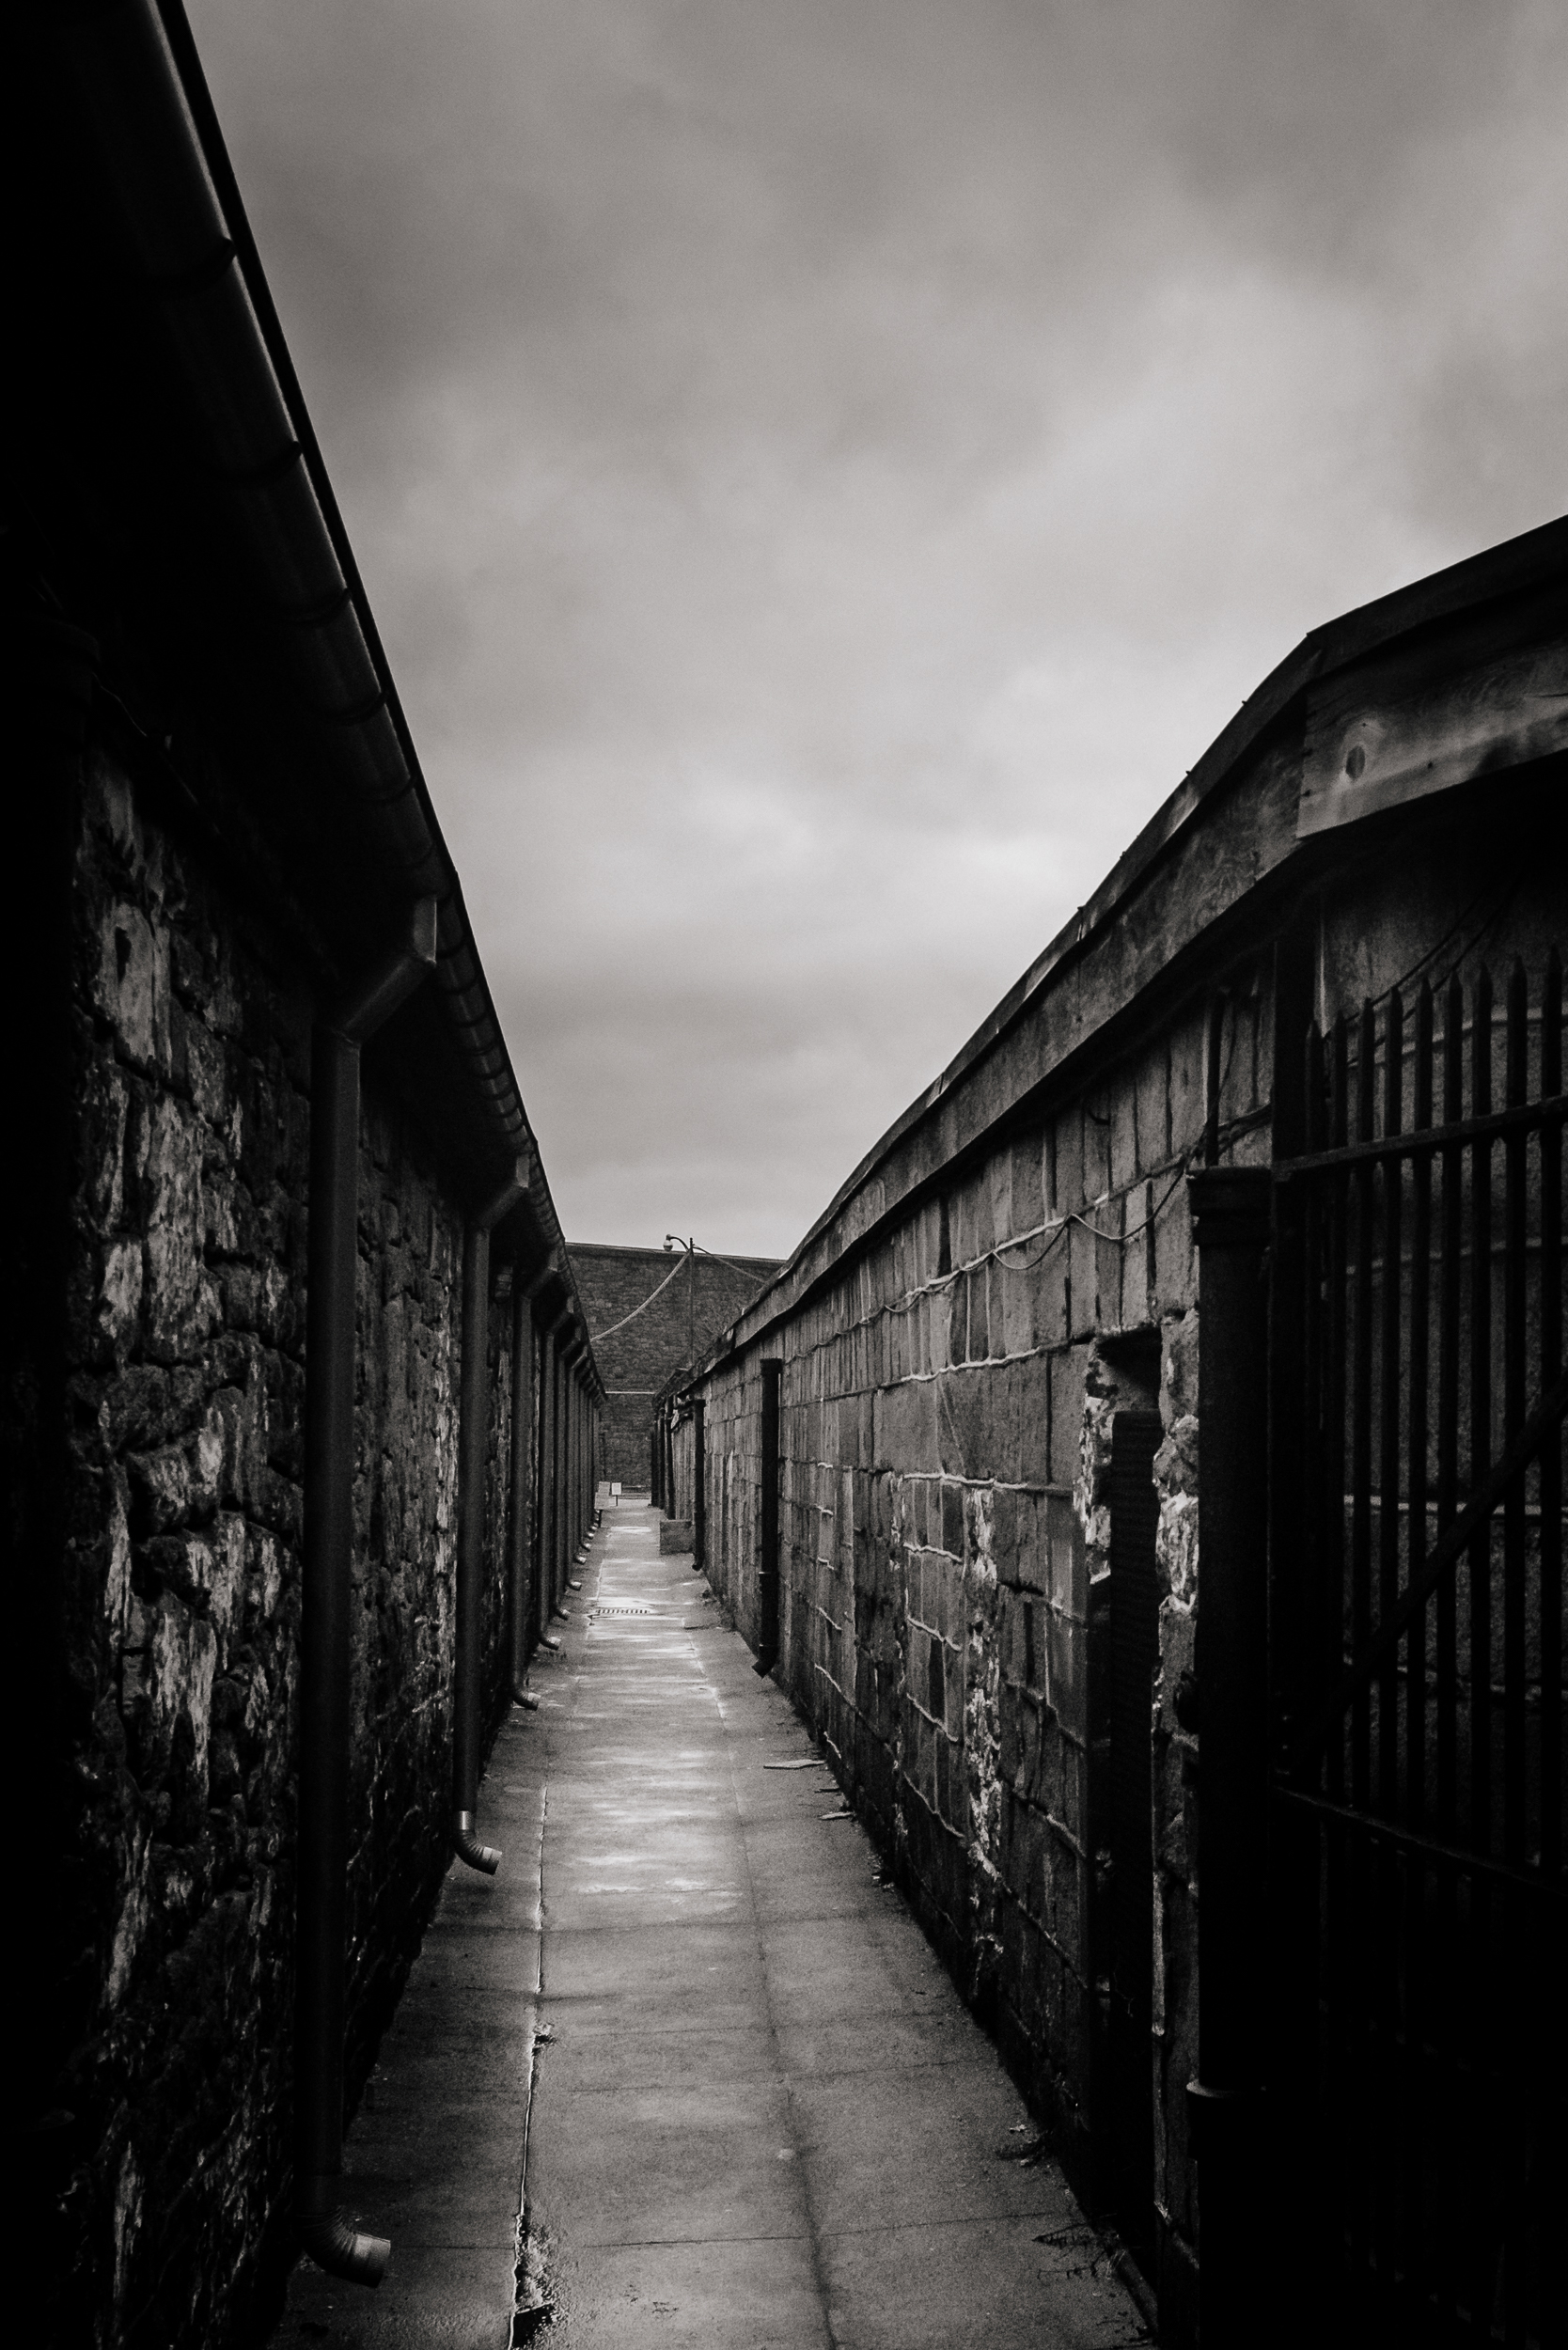 prison yard, 2015.